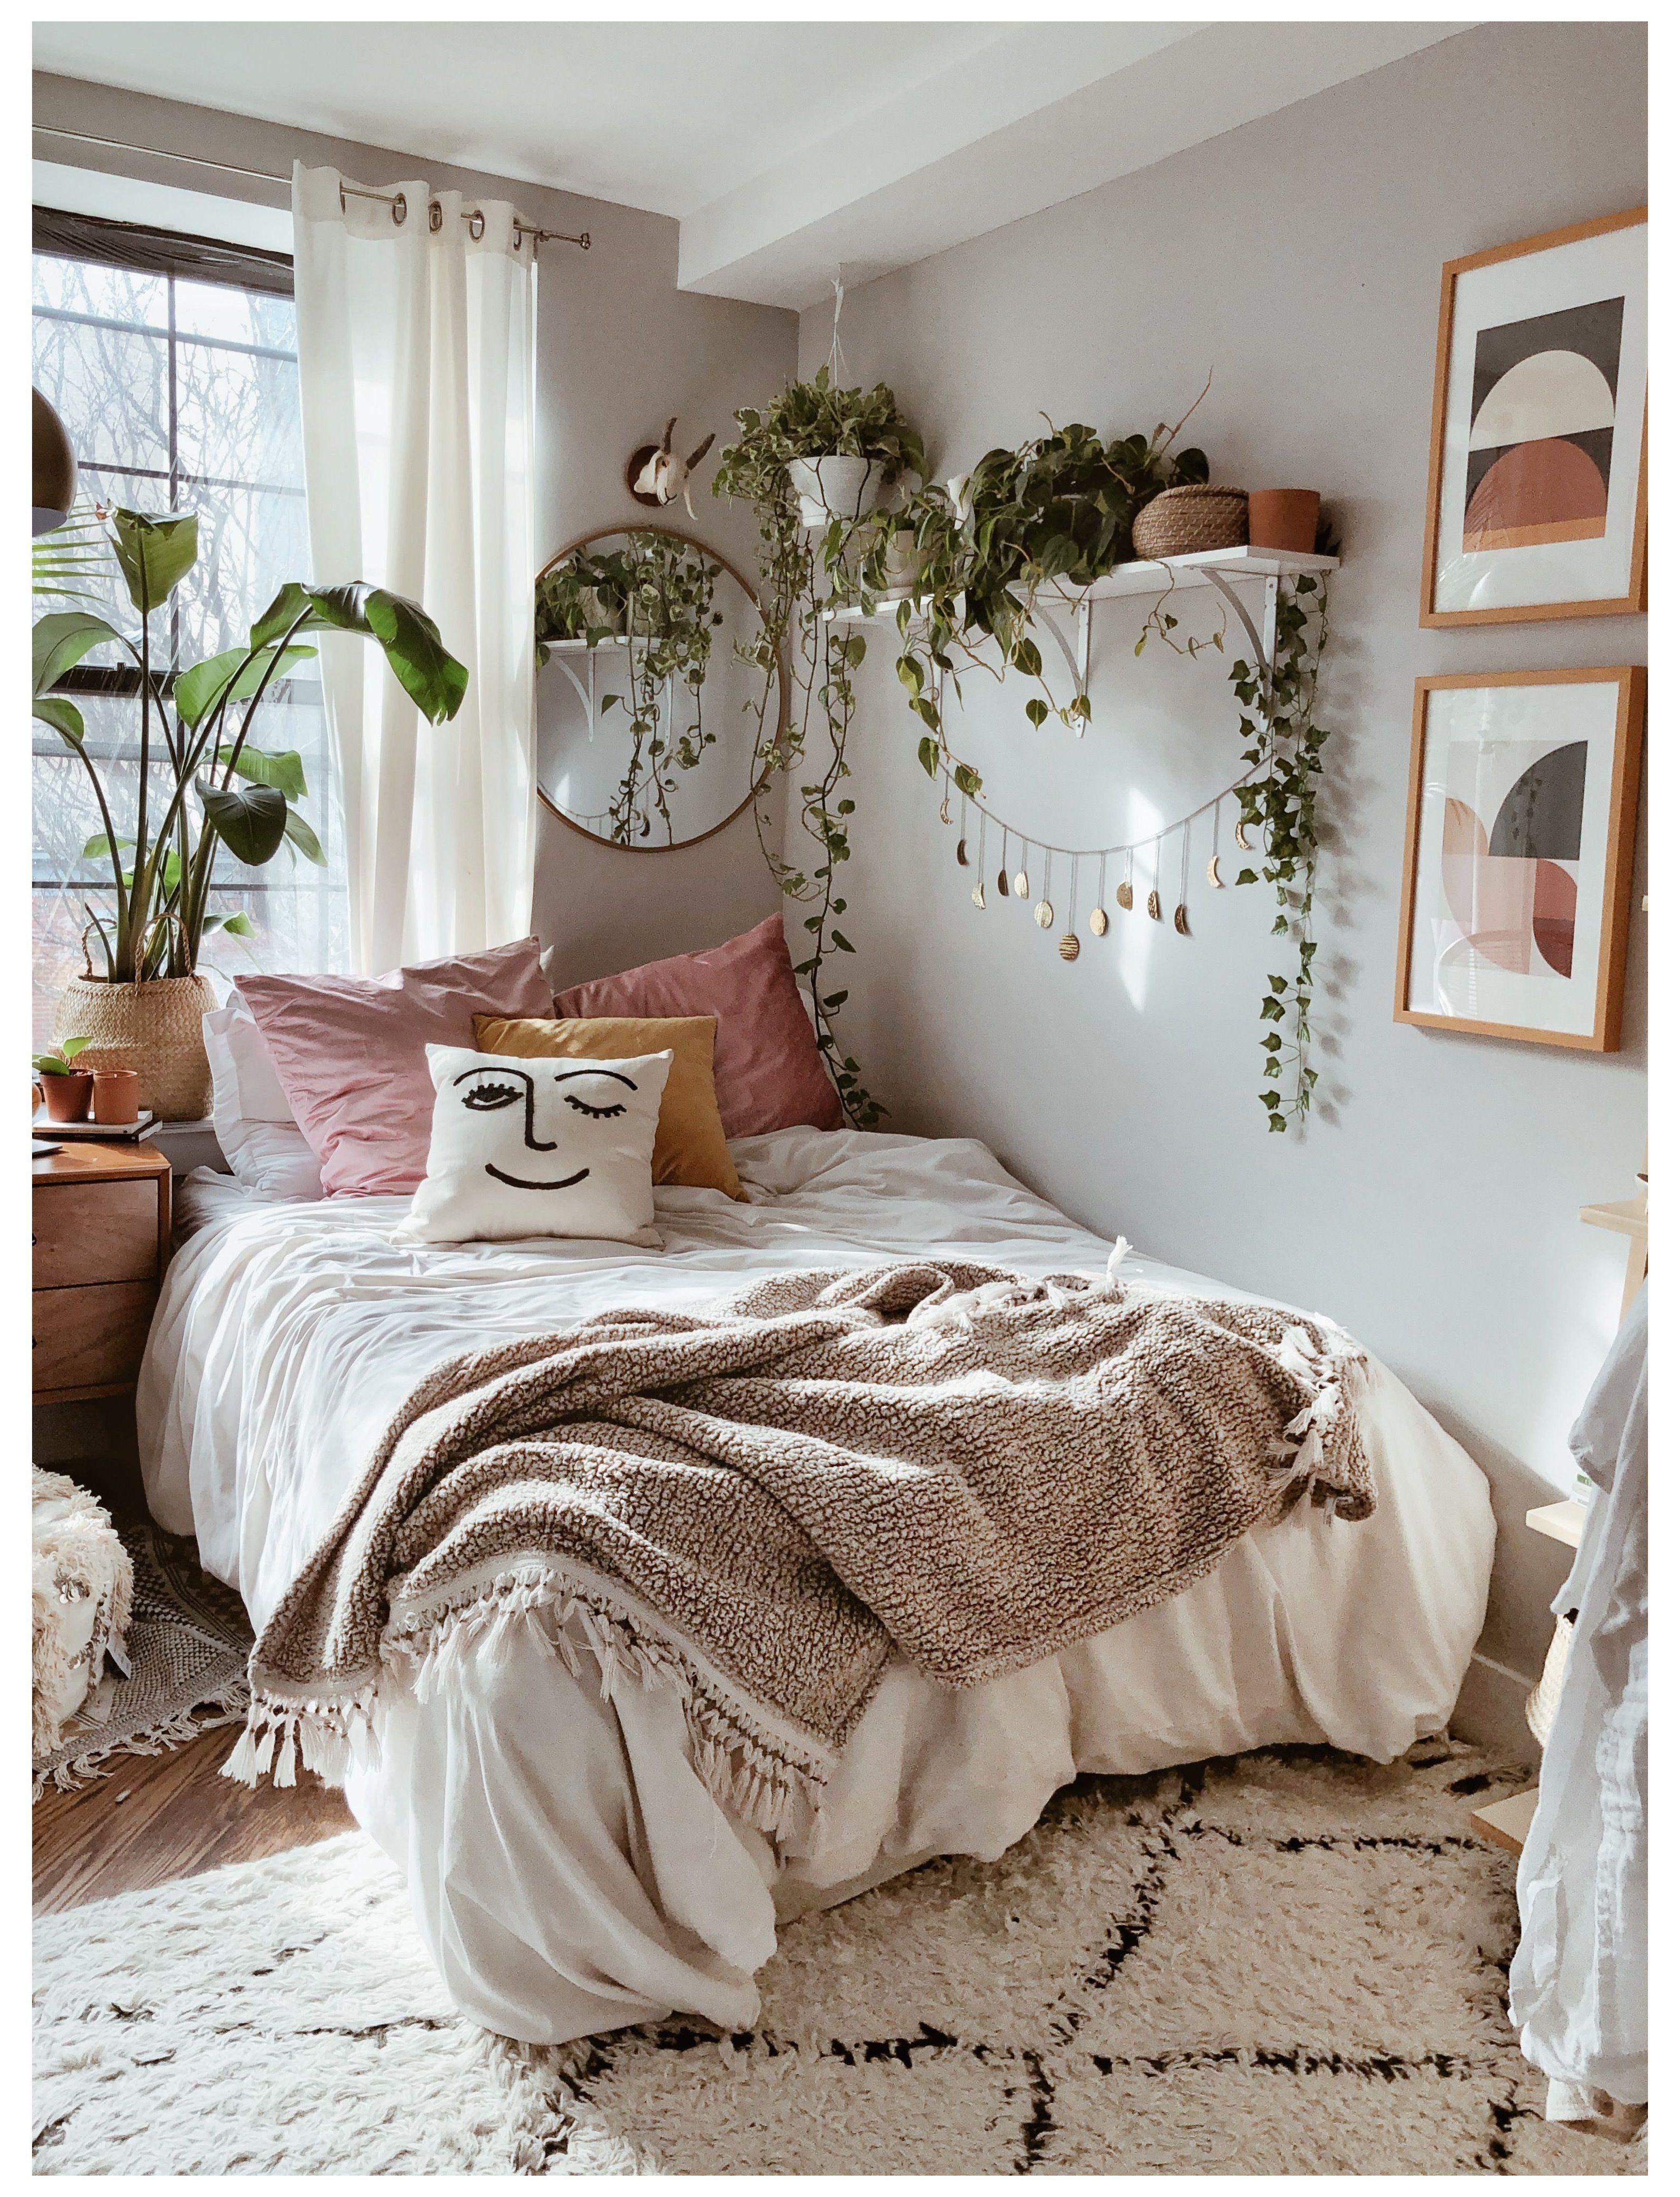 plants in bedroom boho bohemian home - Boho Bedroom Decor ...